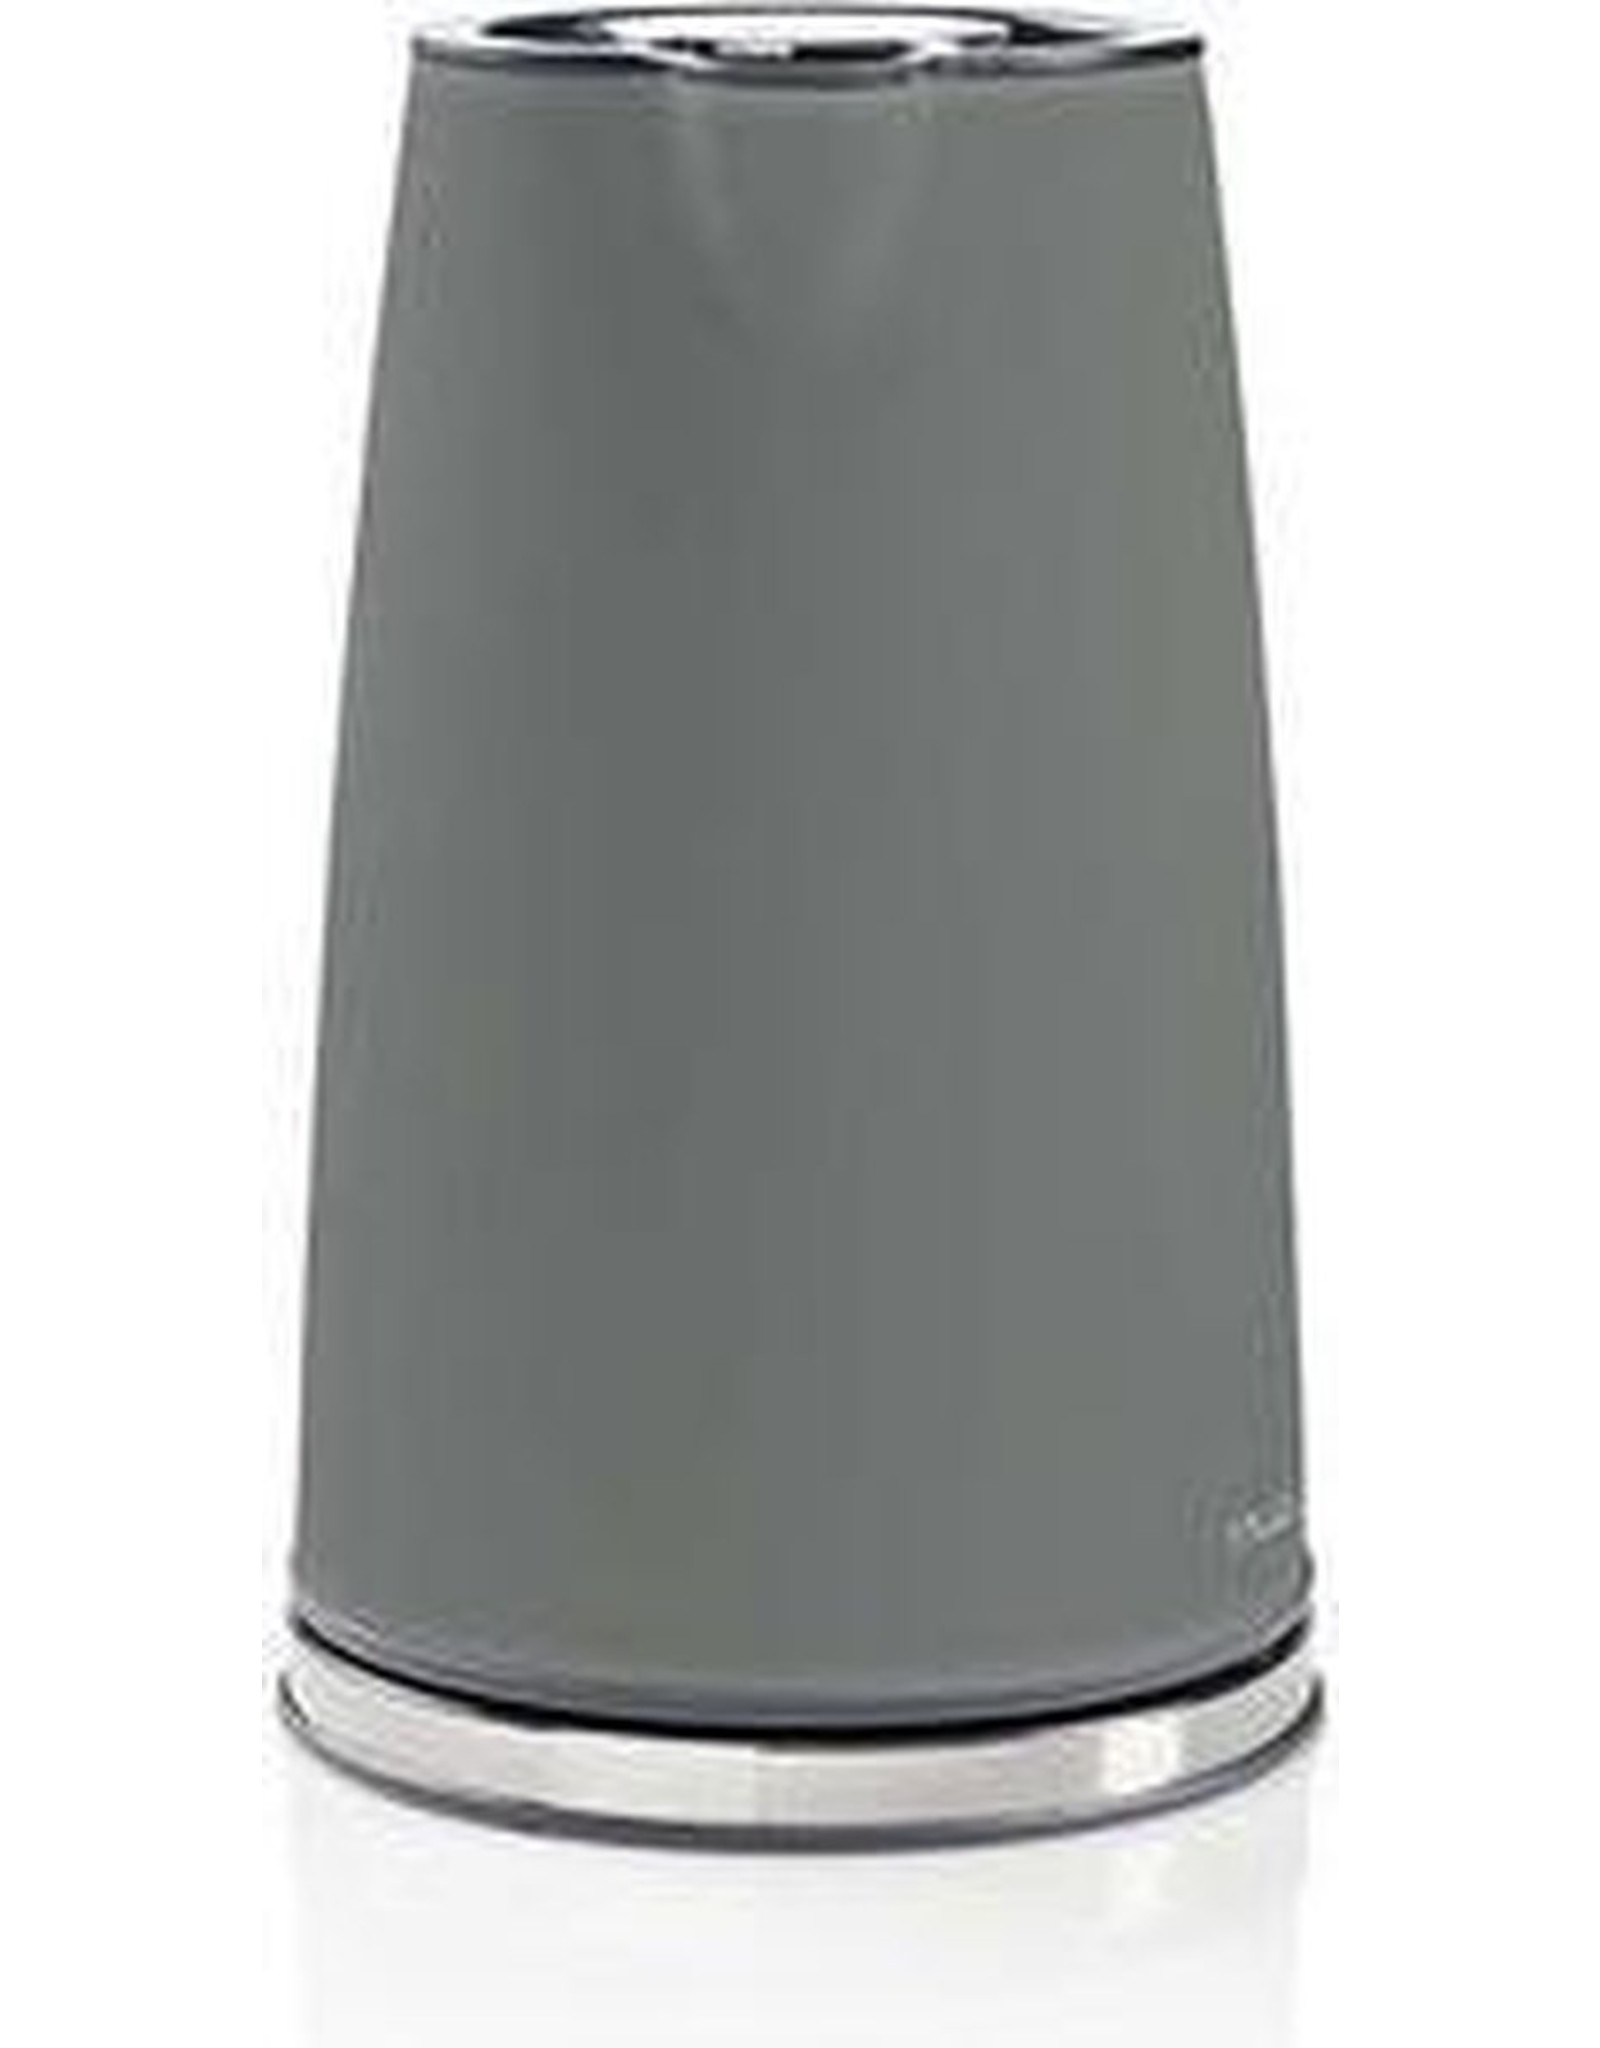 Nedis Nedis - Waterkoker - Modern Design  - 1.7L - Grijs